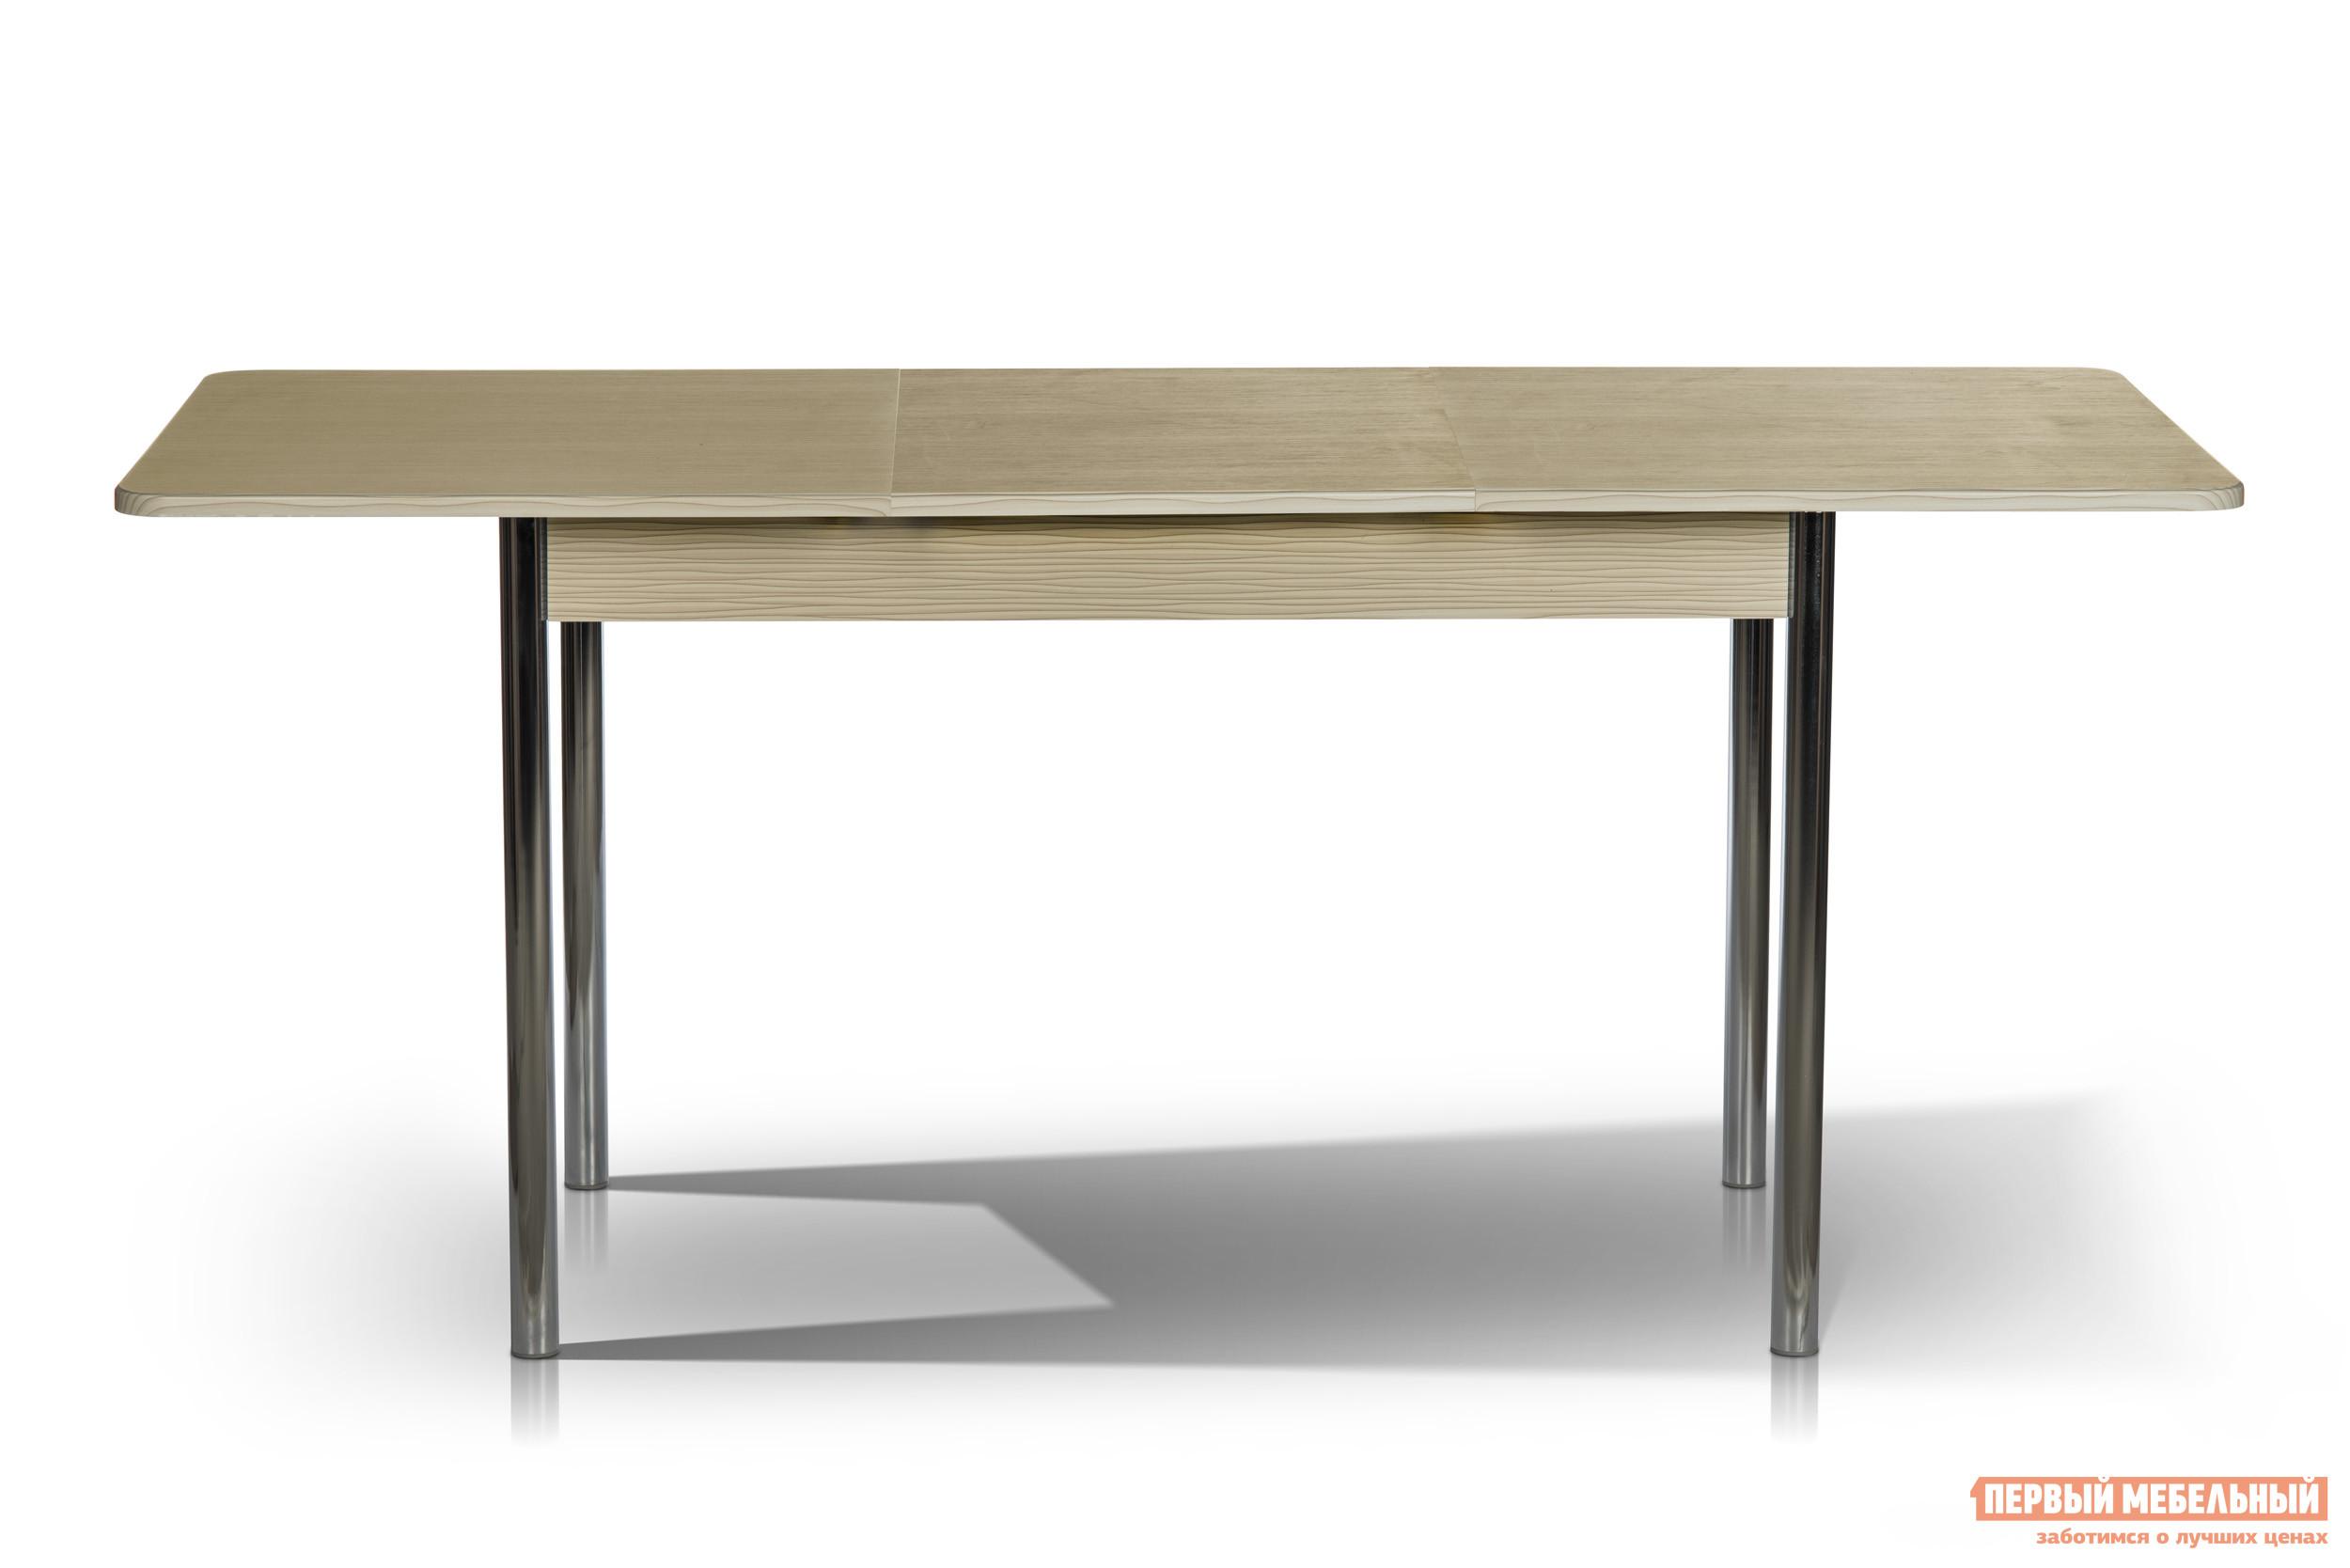 Кухонный стол МегаЭлатон Капри Дым белый